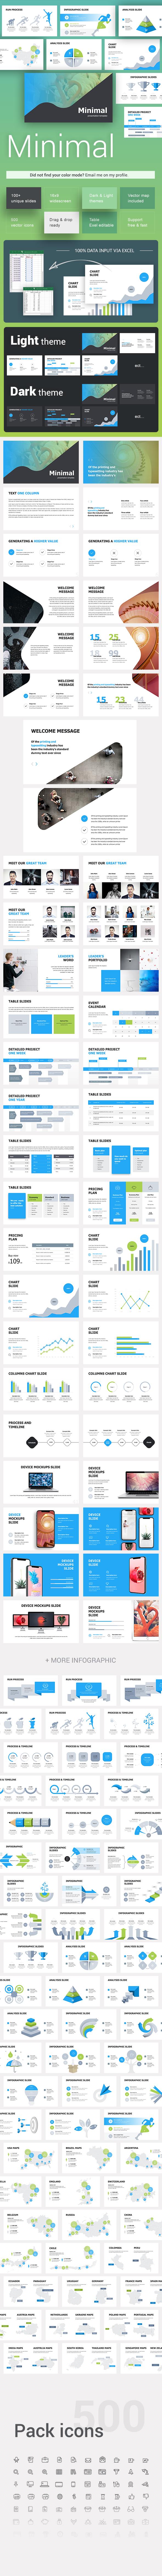 Minimal Corporate Powerpoint Template - Creative PowerPoint Templates